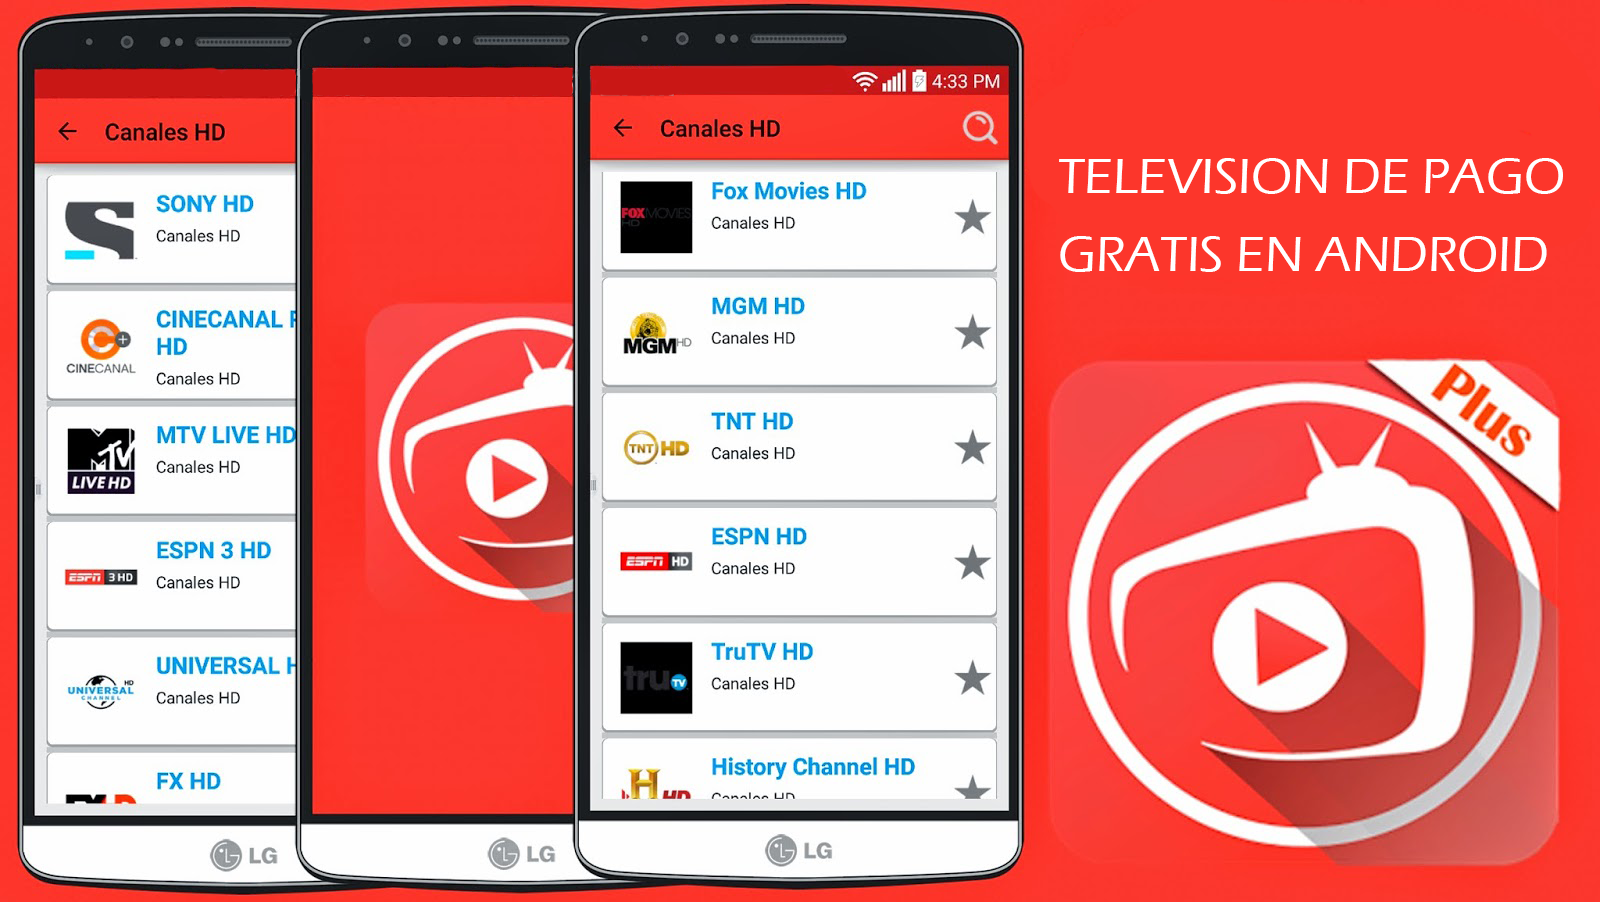 Mega Player Tv De Pago Gratis En Android